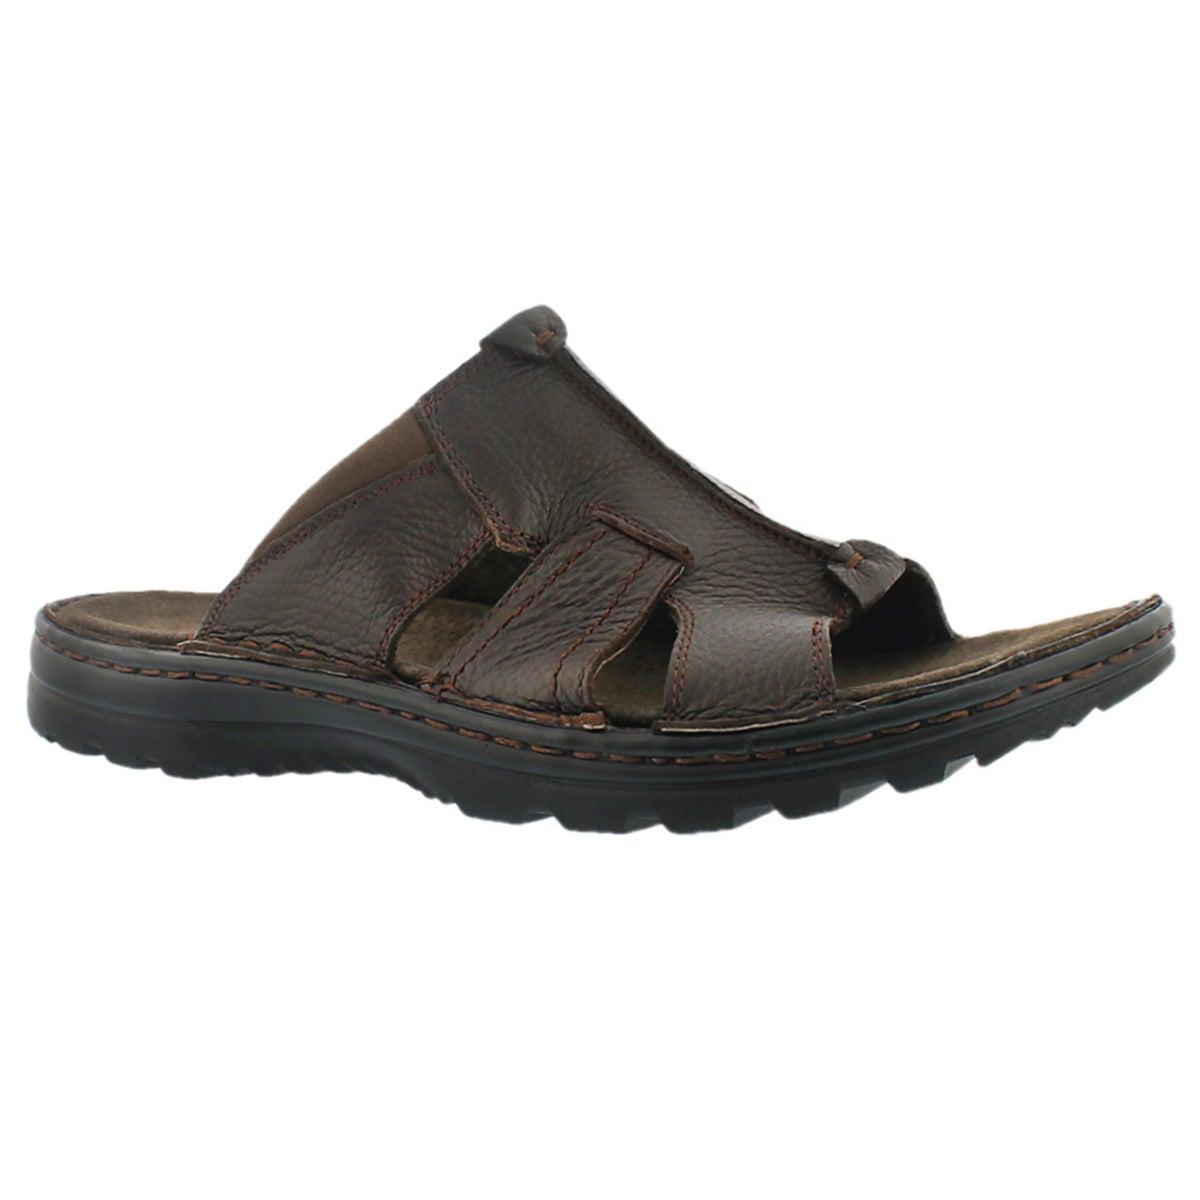 Men's KIEFER brown slip on casual sandals